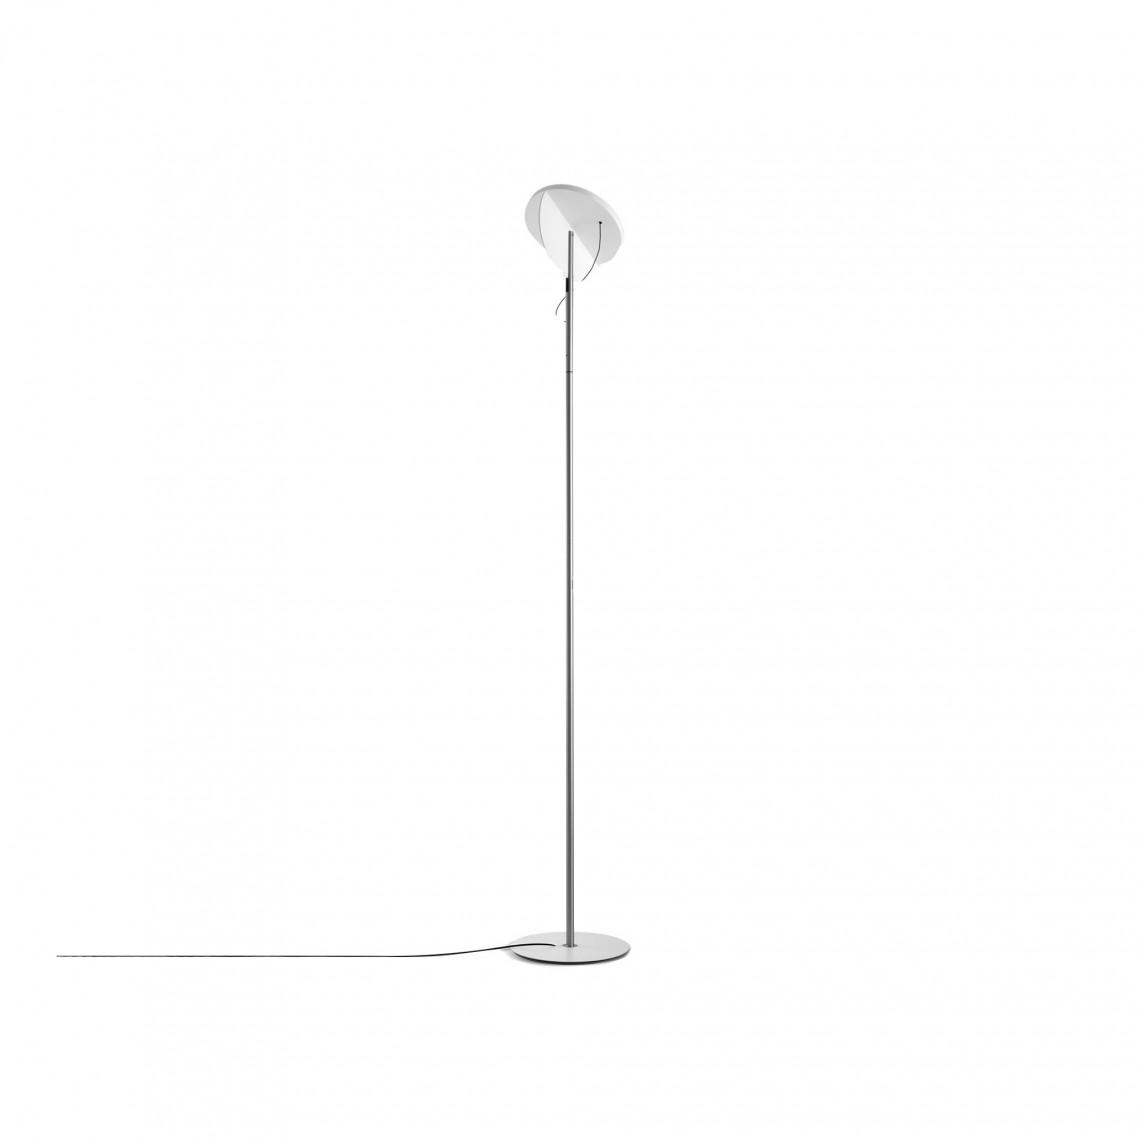 Copernica P190 - Floor Lamp Satin Nickel